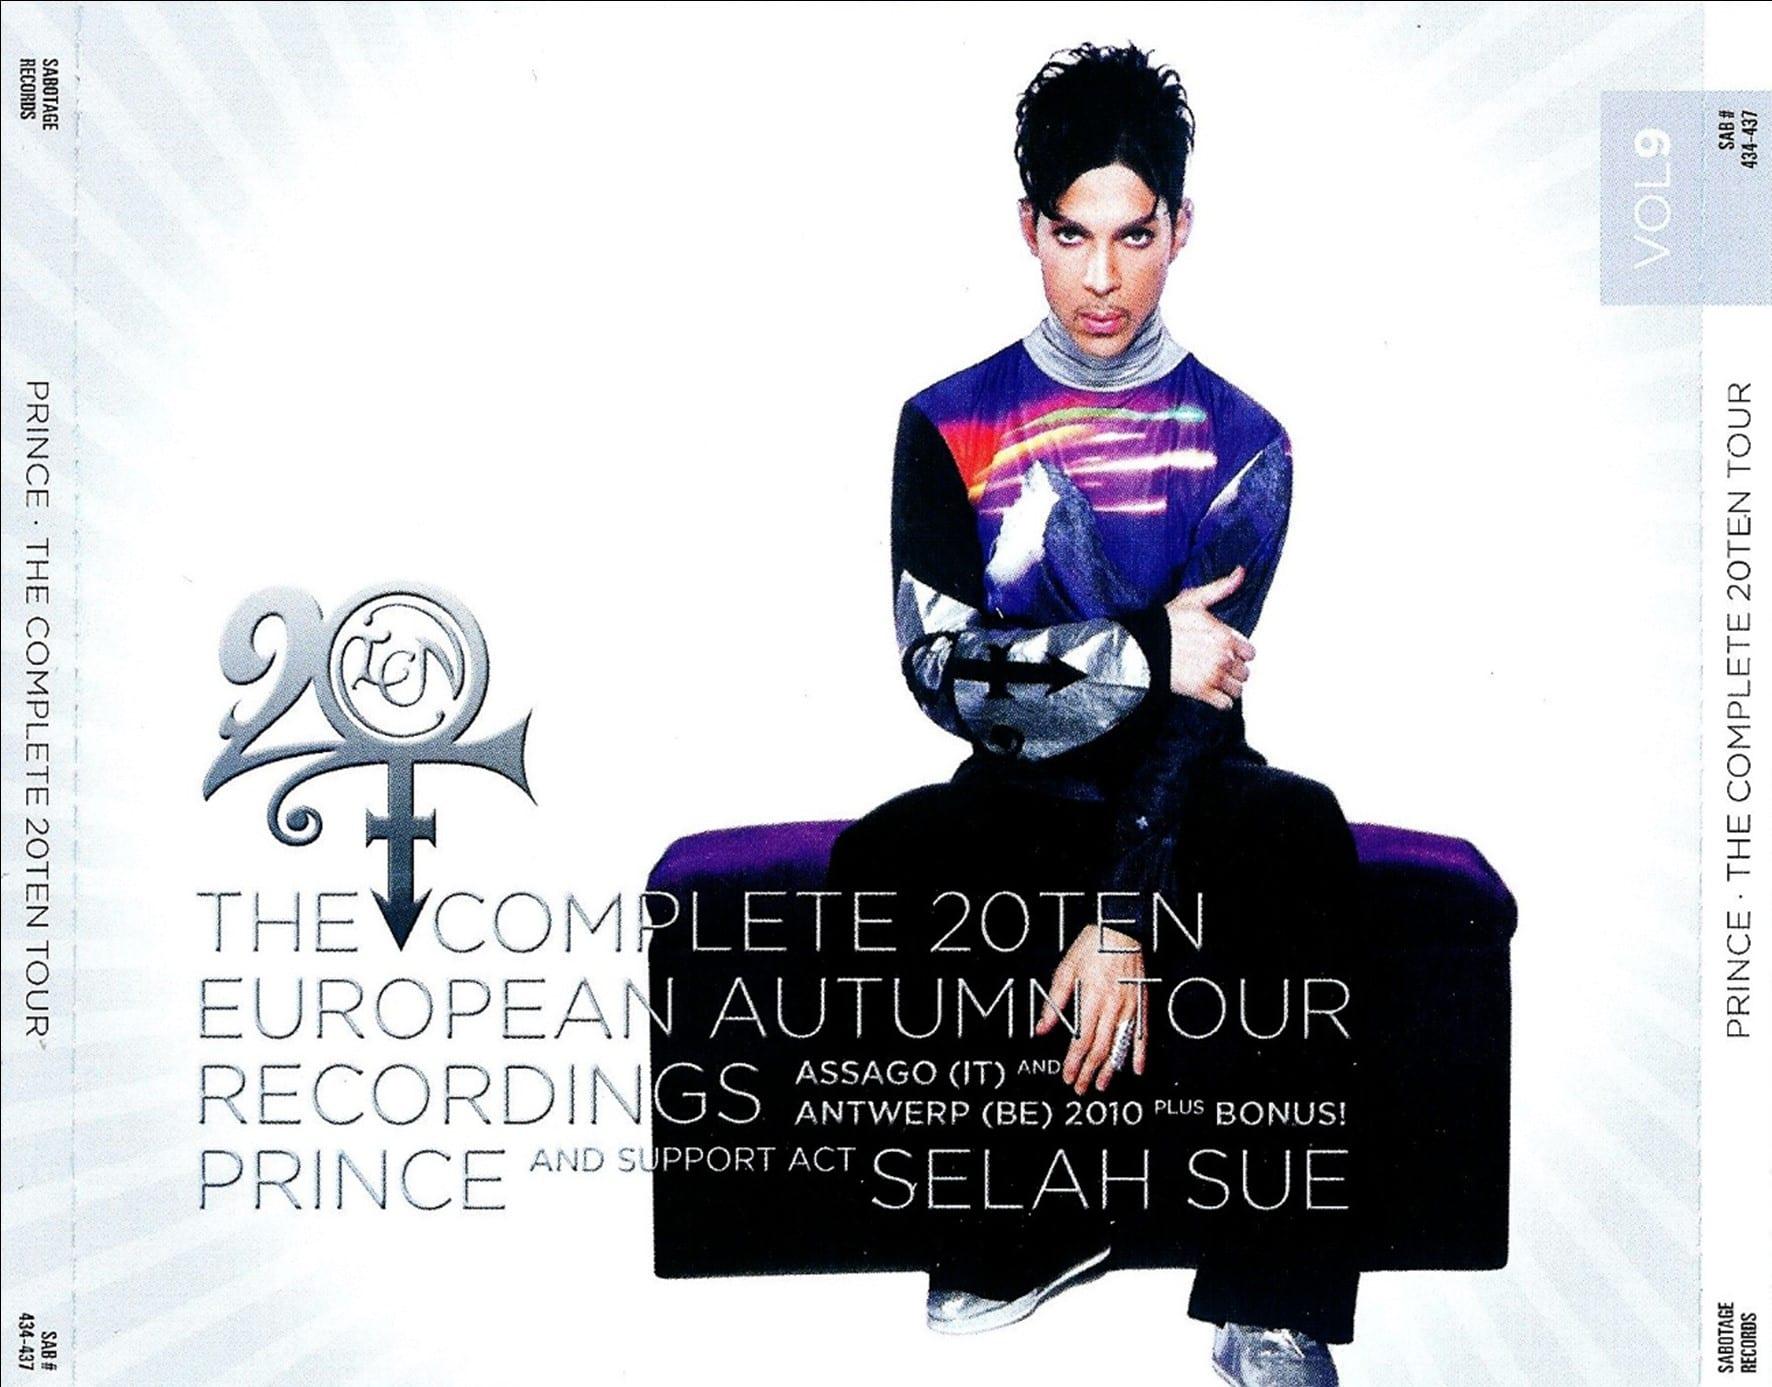 Prince - The Complete 20Ten European Autumn Tour Recordings Vol. 8 (#SAB 430-433) (2011) 4 CD SET 8